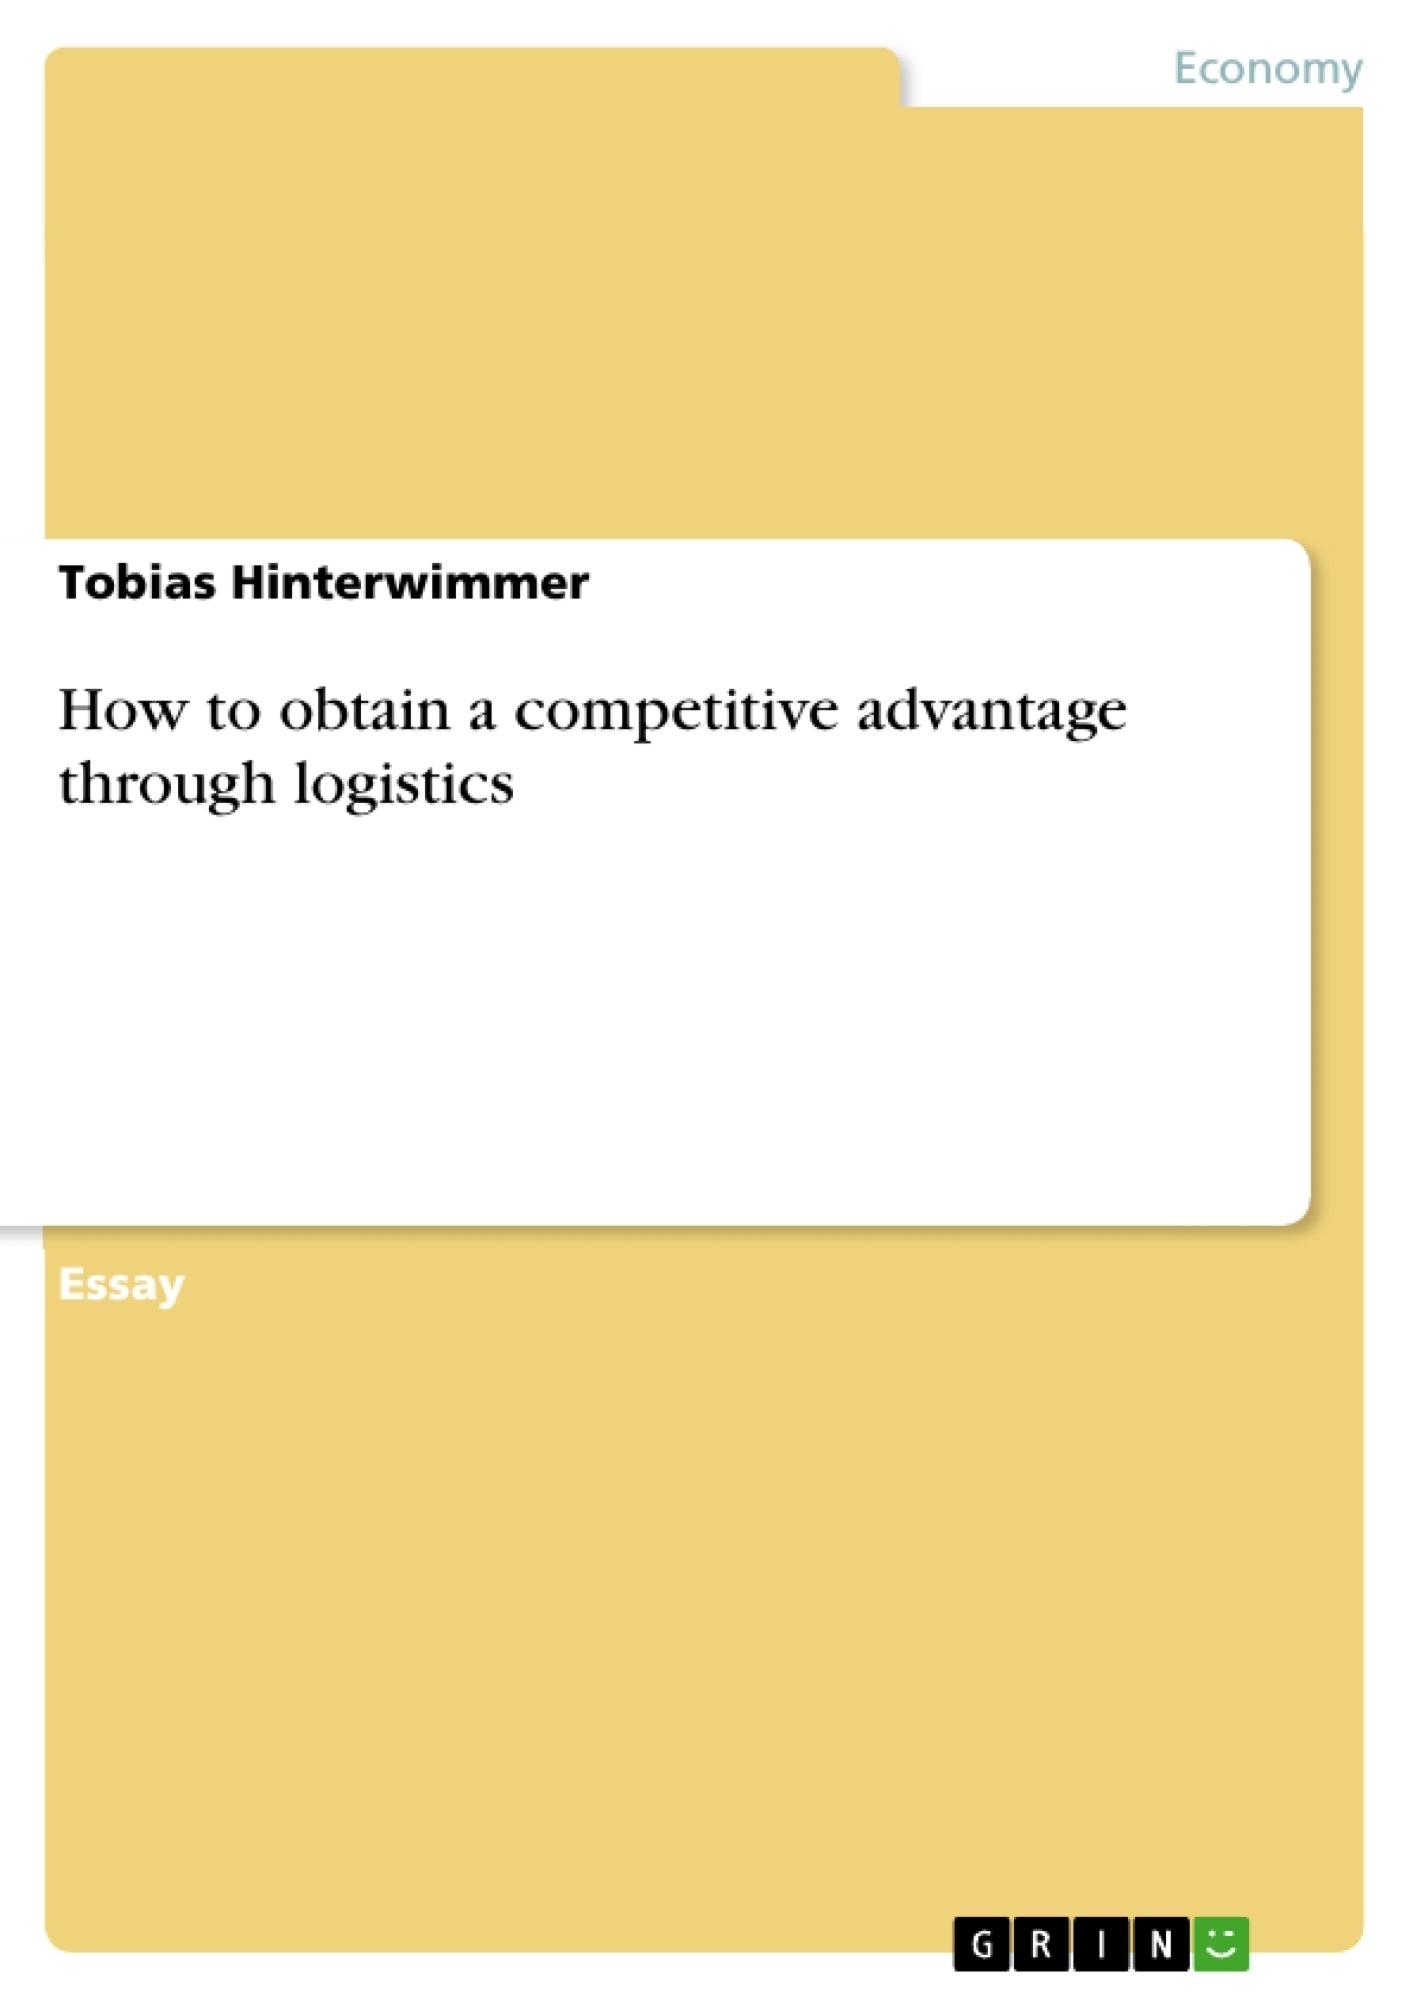 Title: How to obtain a competitive advantage through logistics